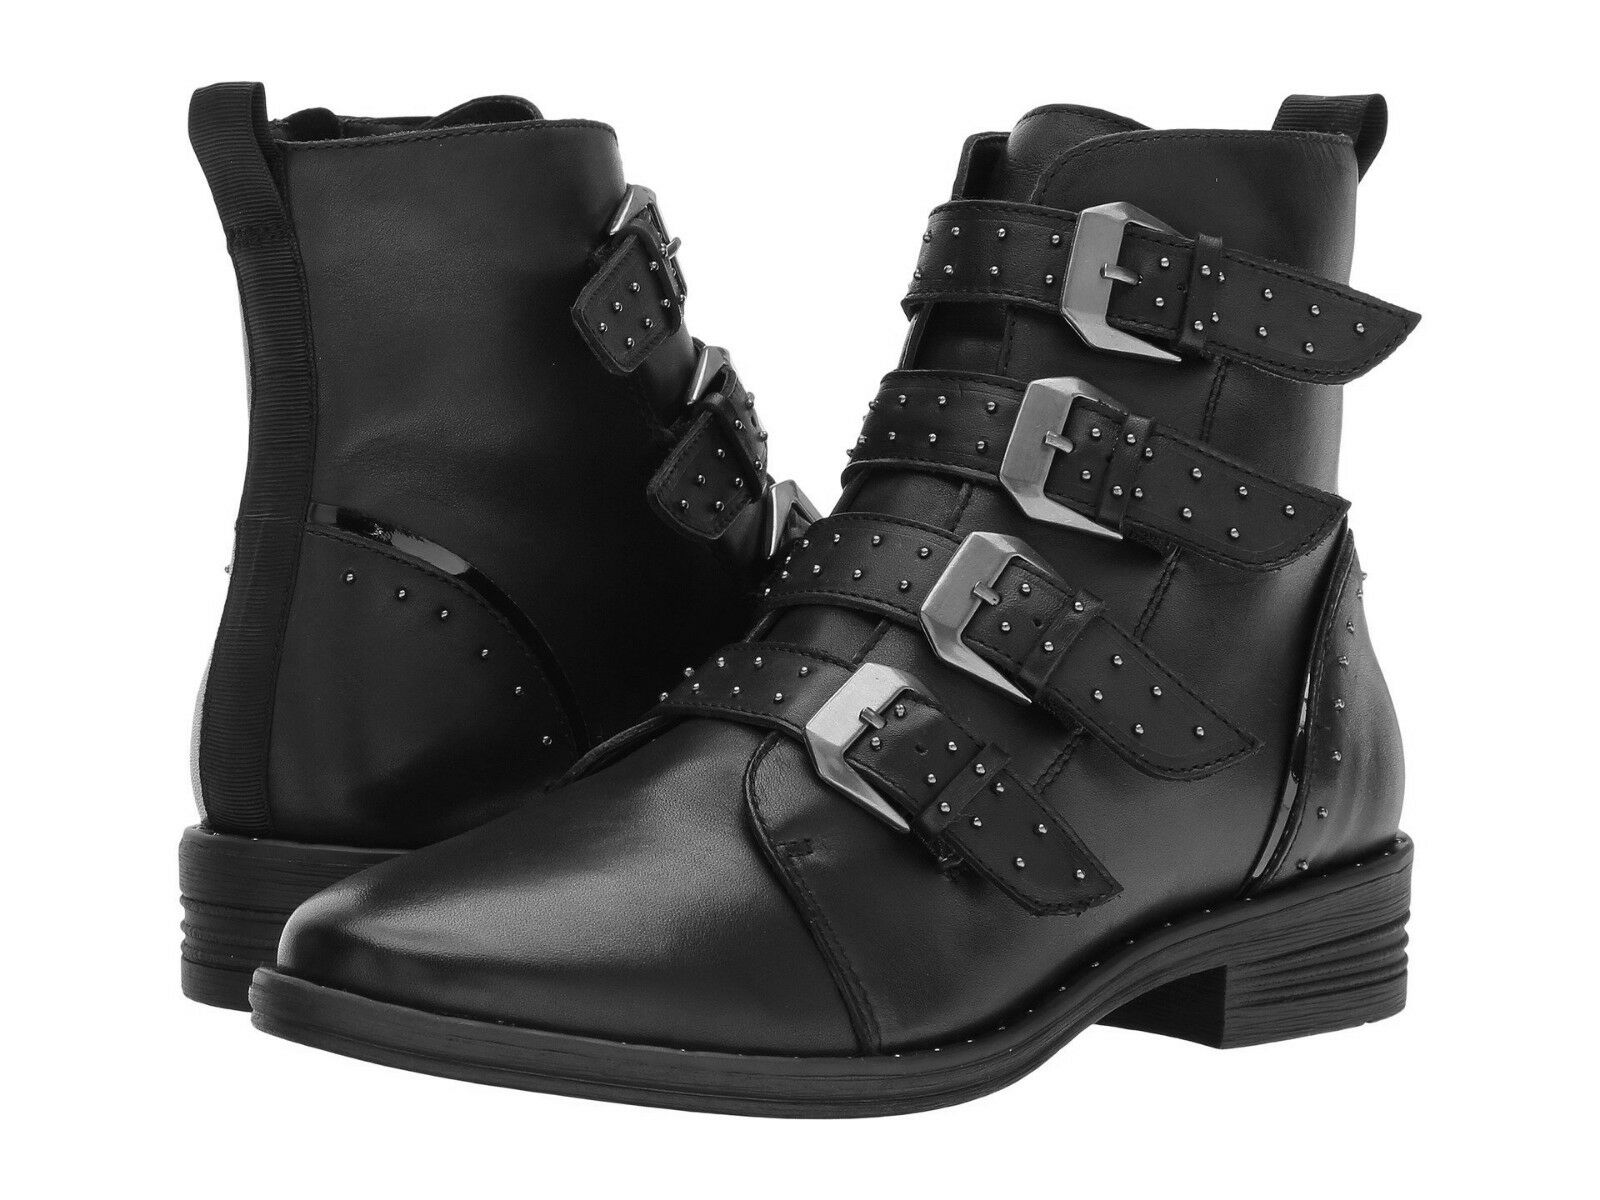 Steve Madden Pursue Boots Buckled Straps Stud Zip Zip Zip Black Leather shoes Moto Biker 8cce68